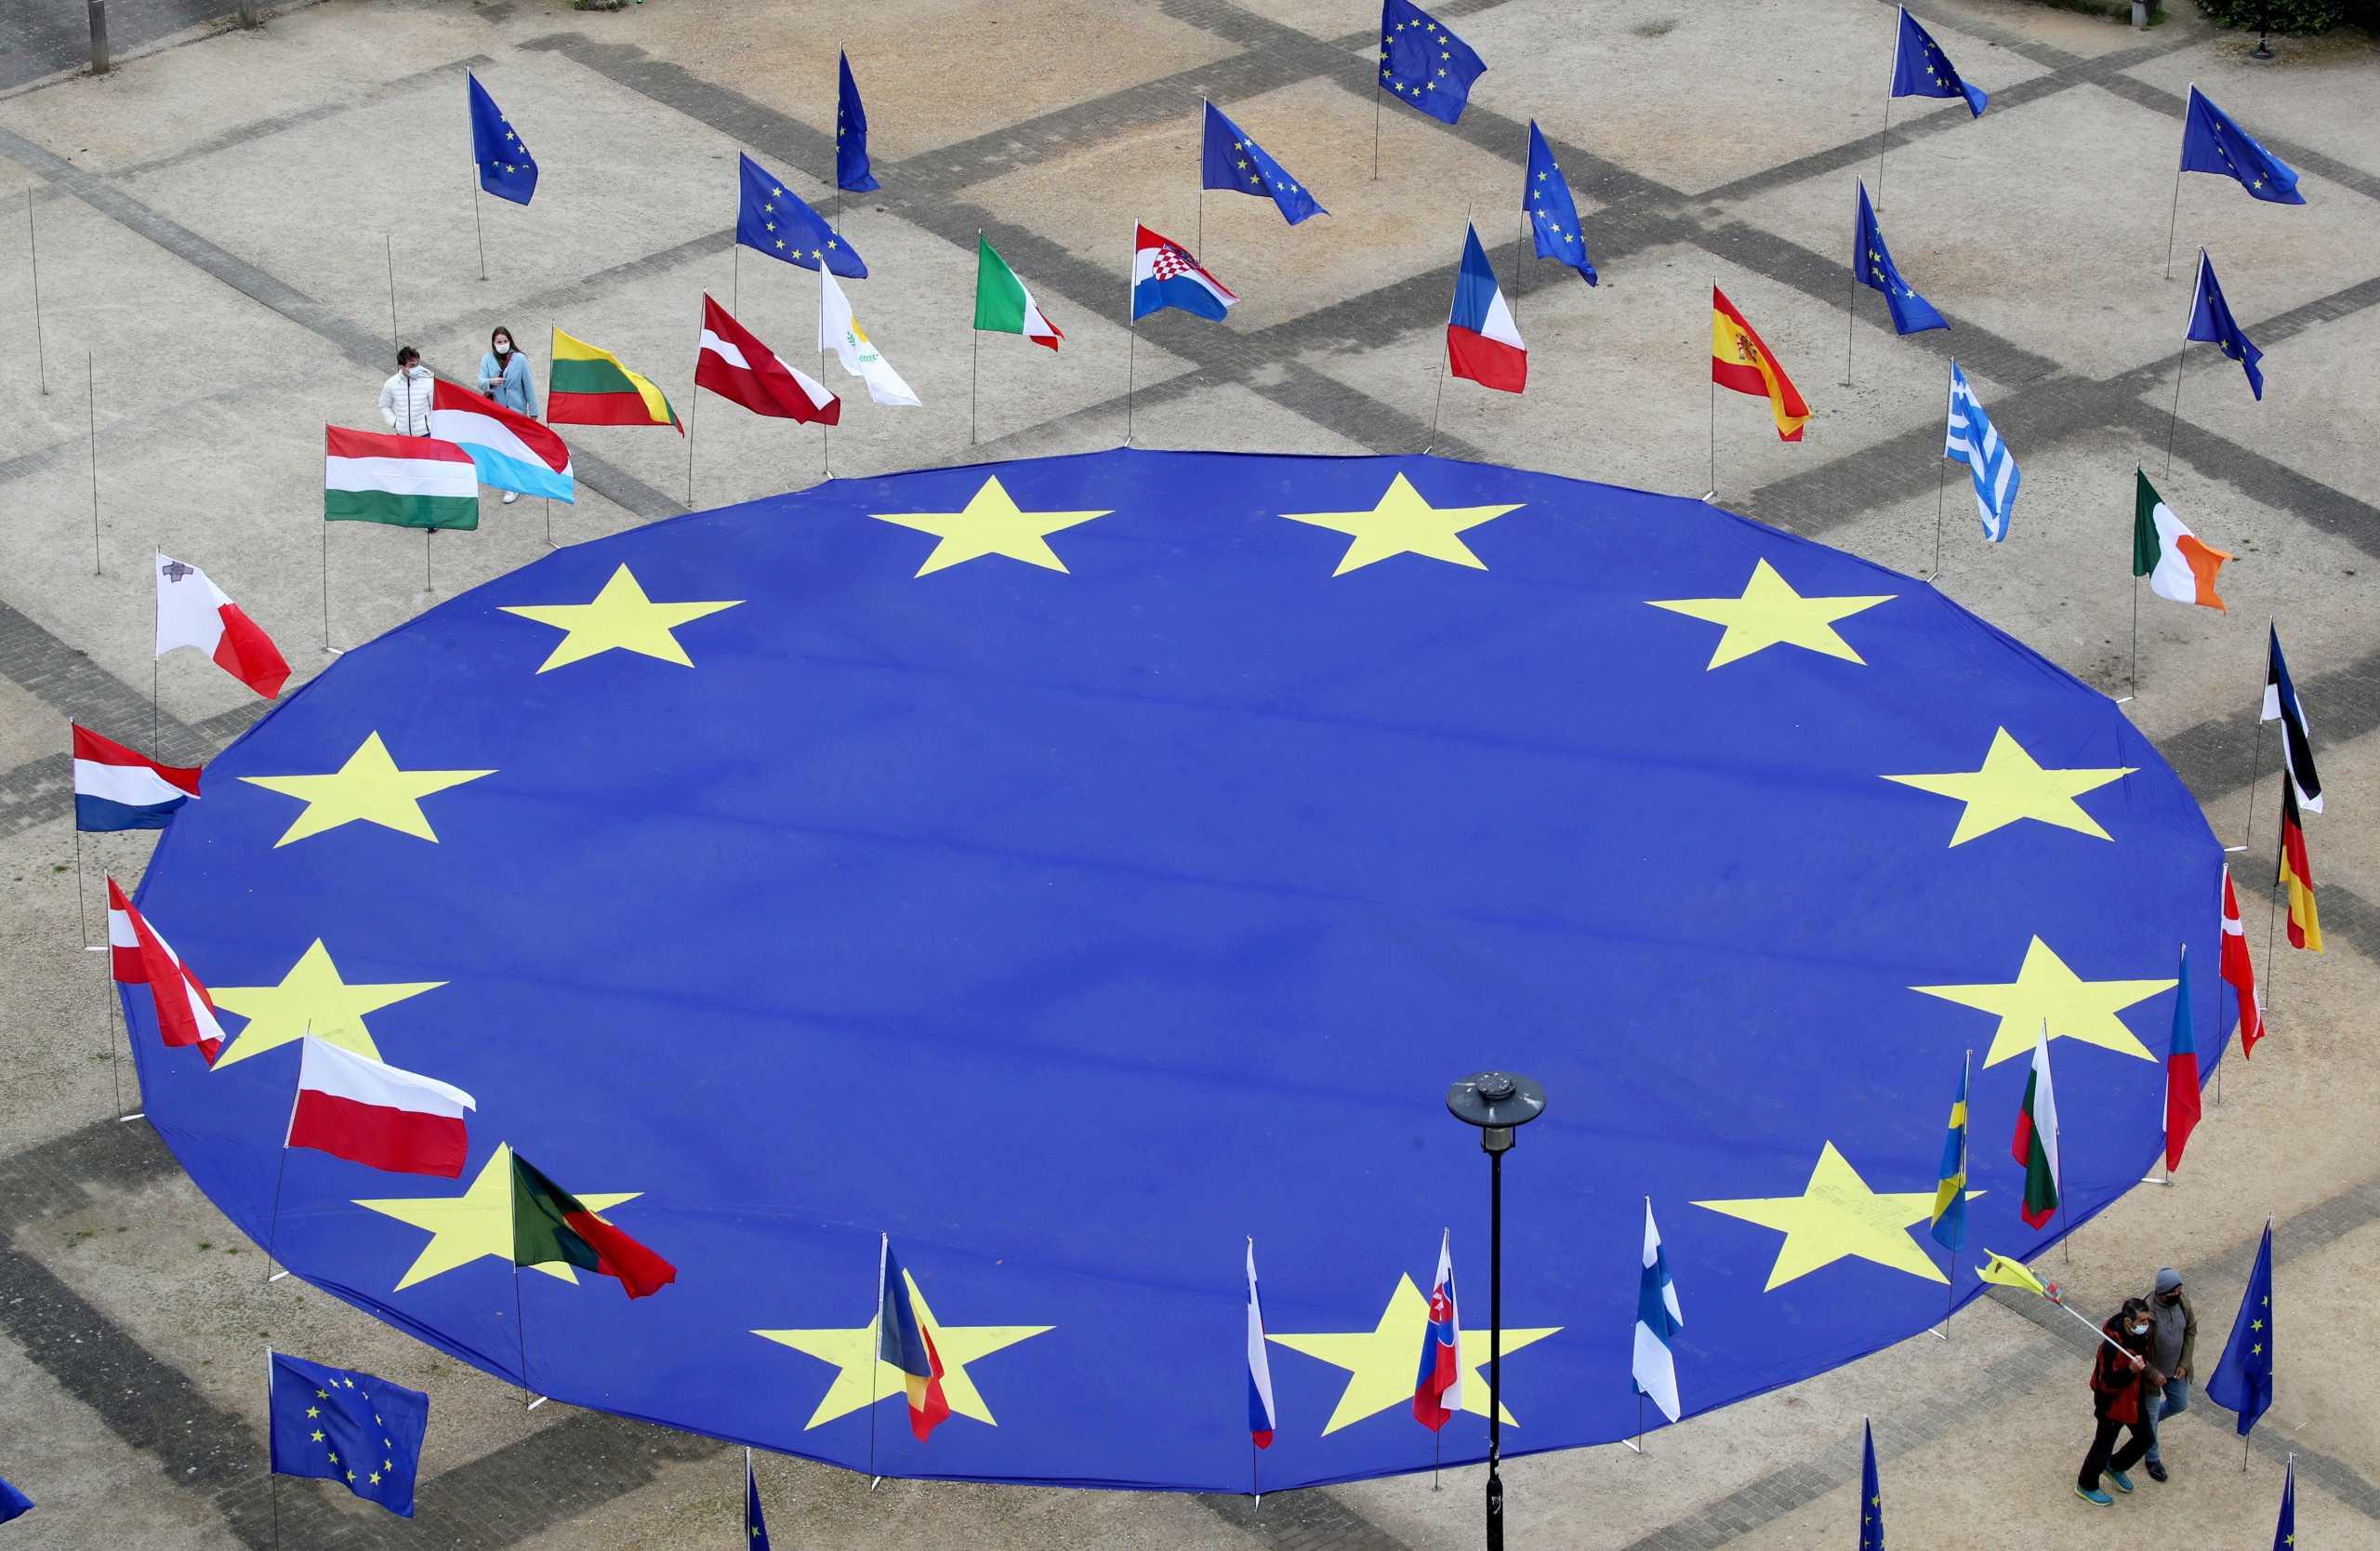 Eurogroup: Ανακάμπτει η οικονομία της Ευρωζώνης – «Θα φτάσει τα προ-πανδημίας επίπεδα μέσα στο 2022»